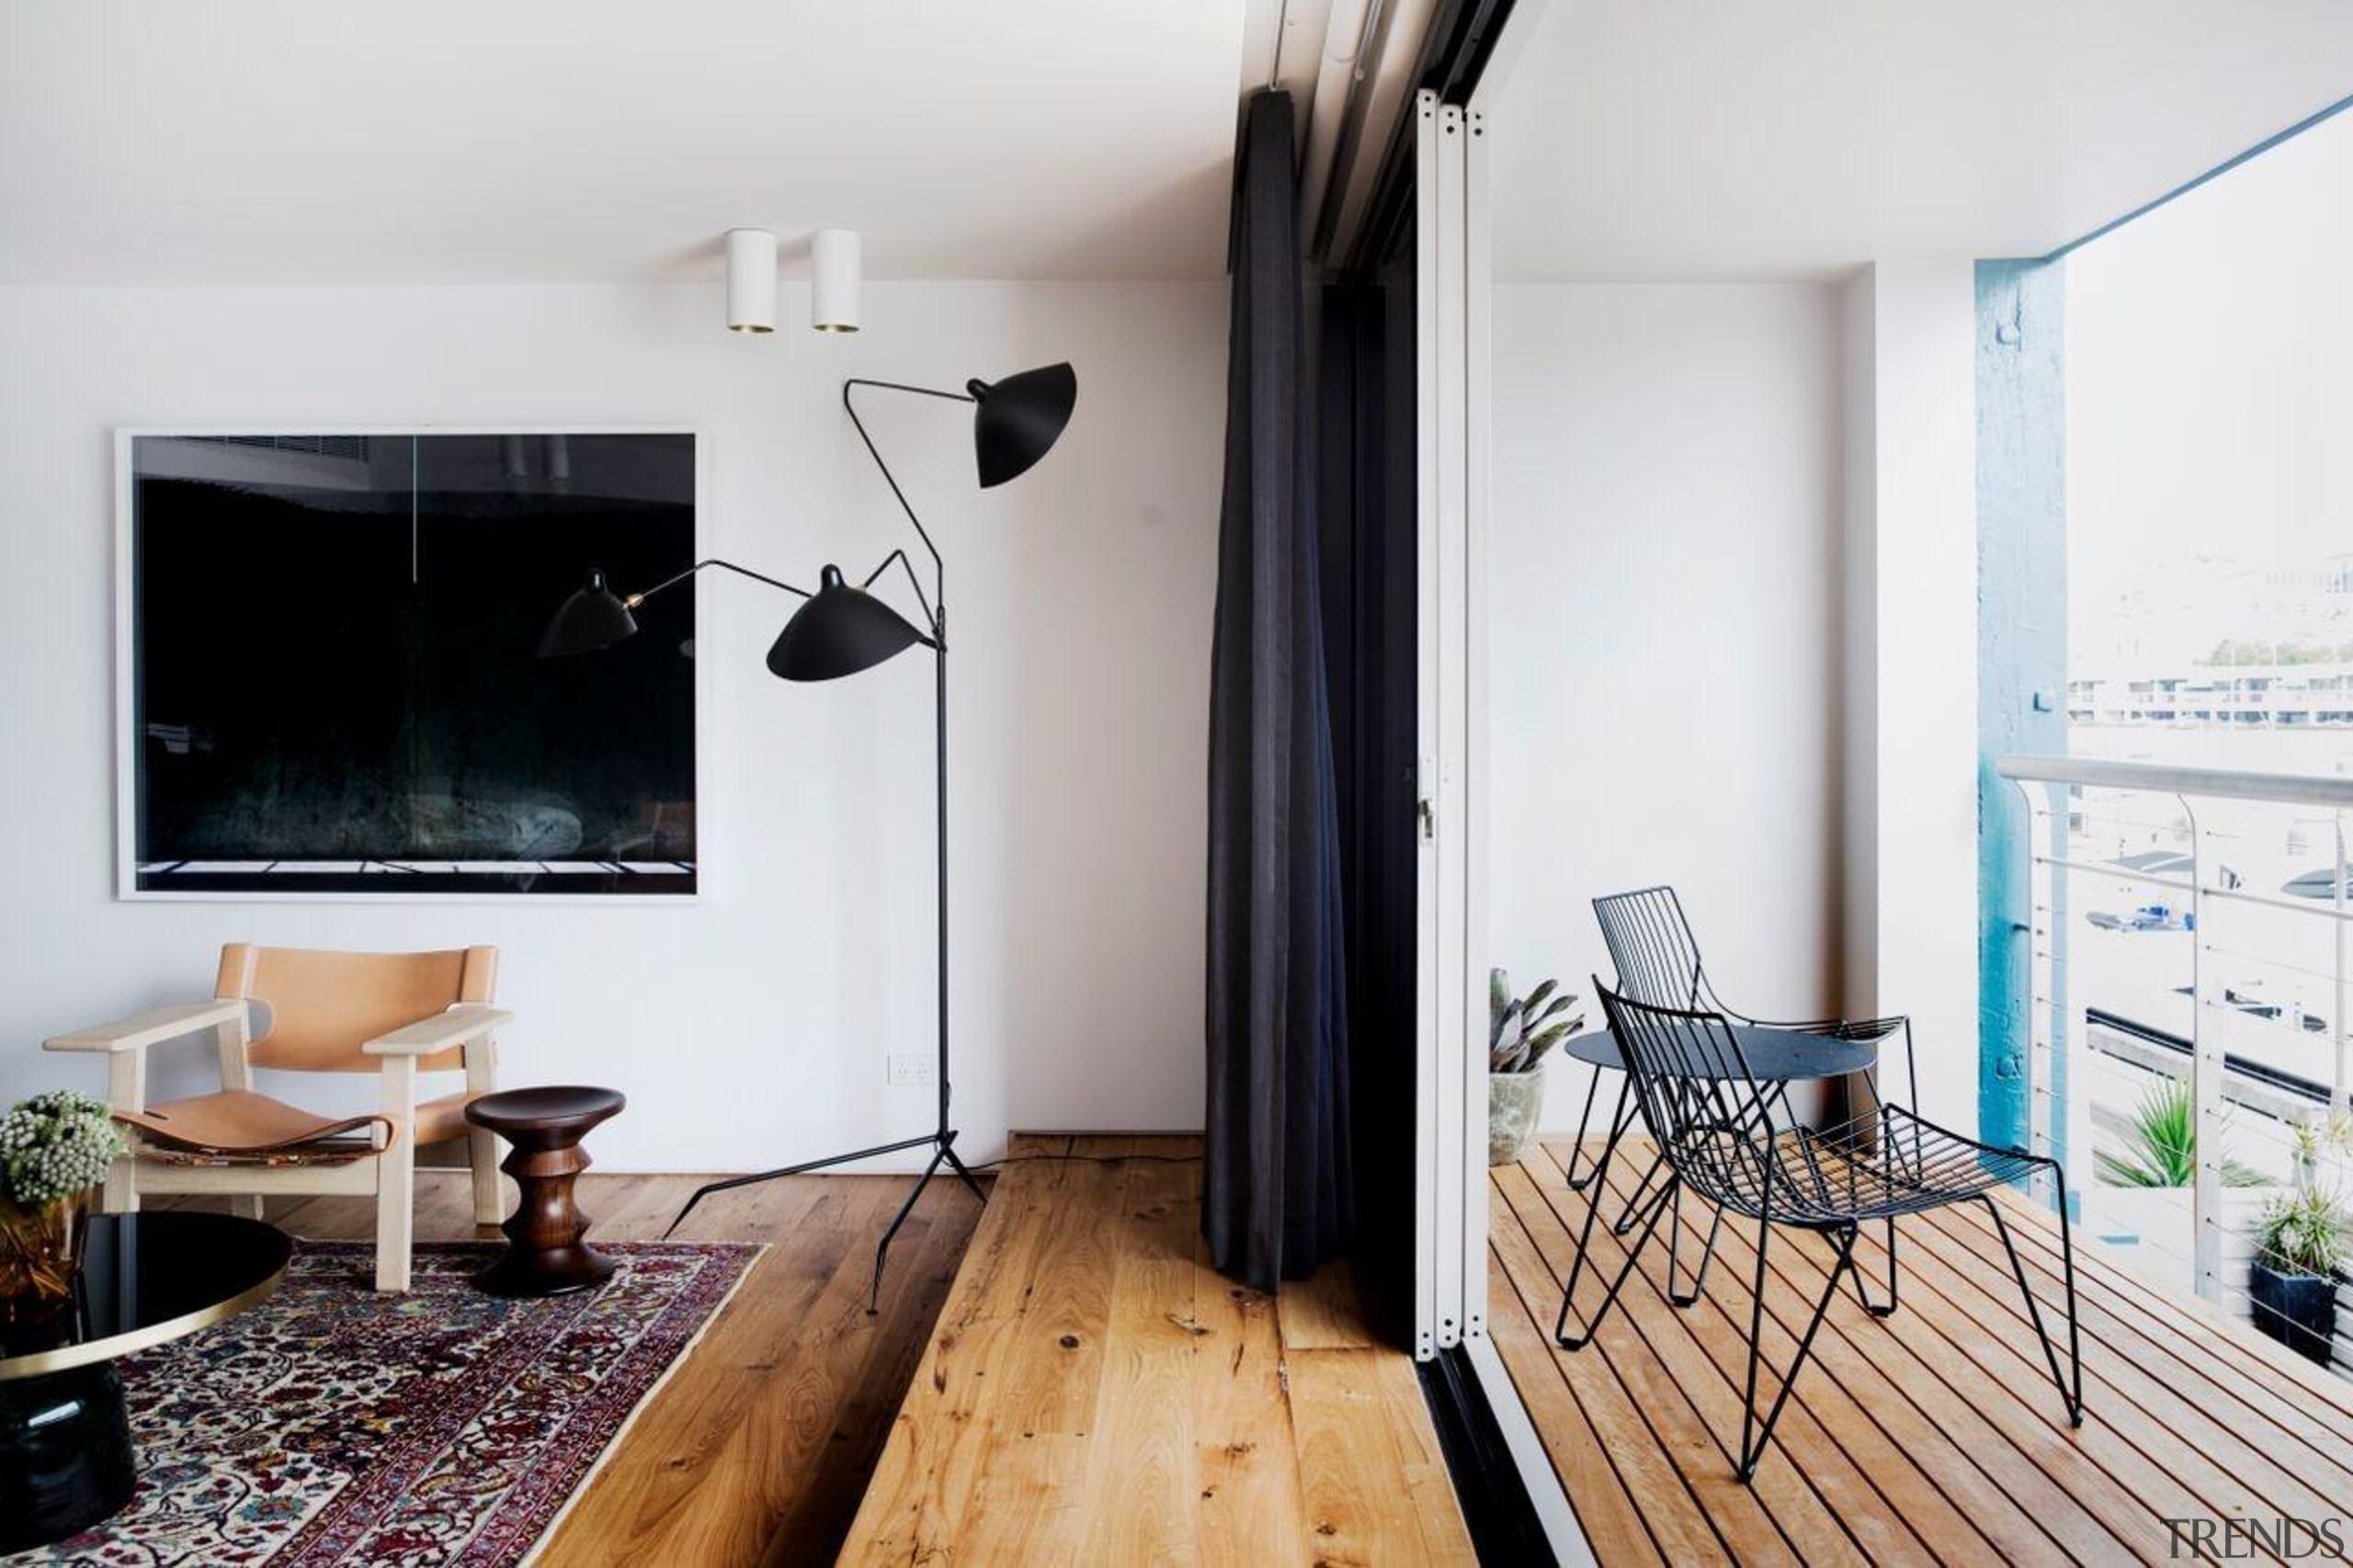 Architect: Architect Prinea - X - floor | floor, home, house, interior design, living room, room, white, gray